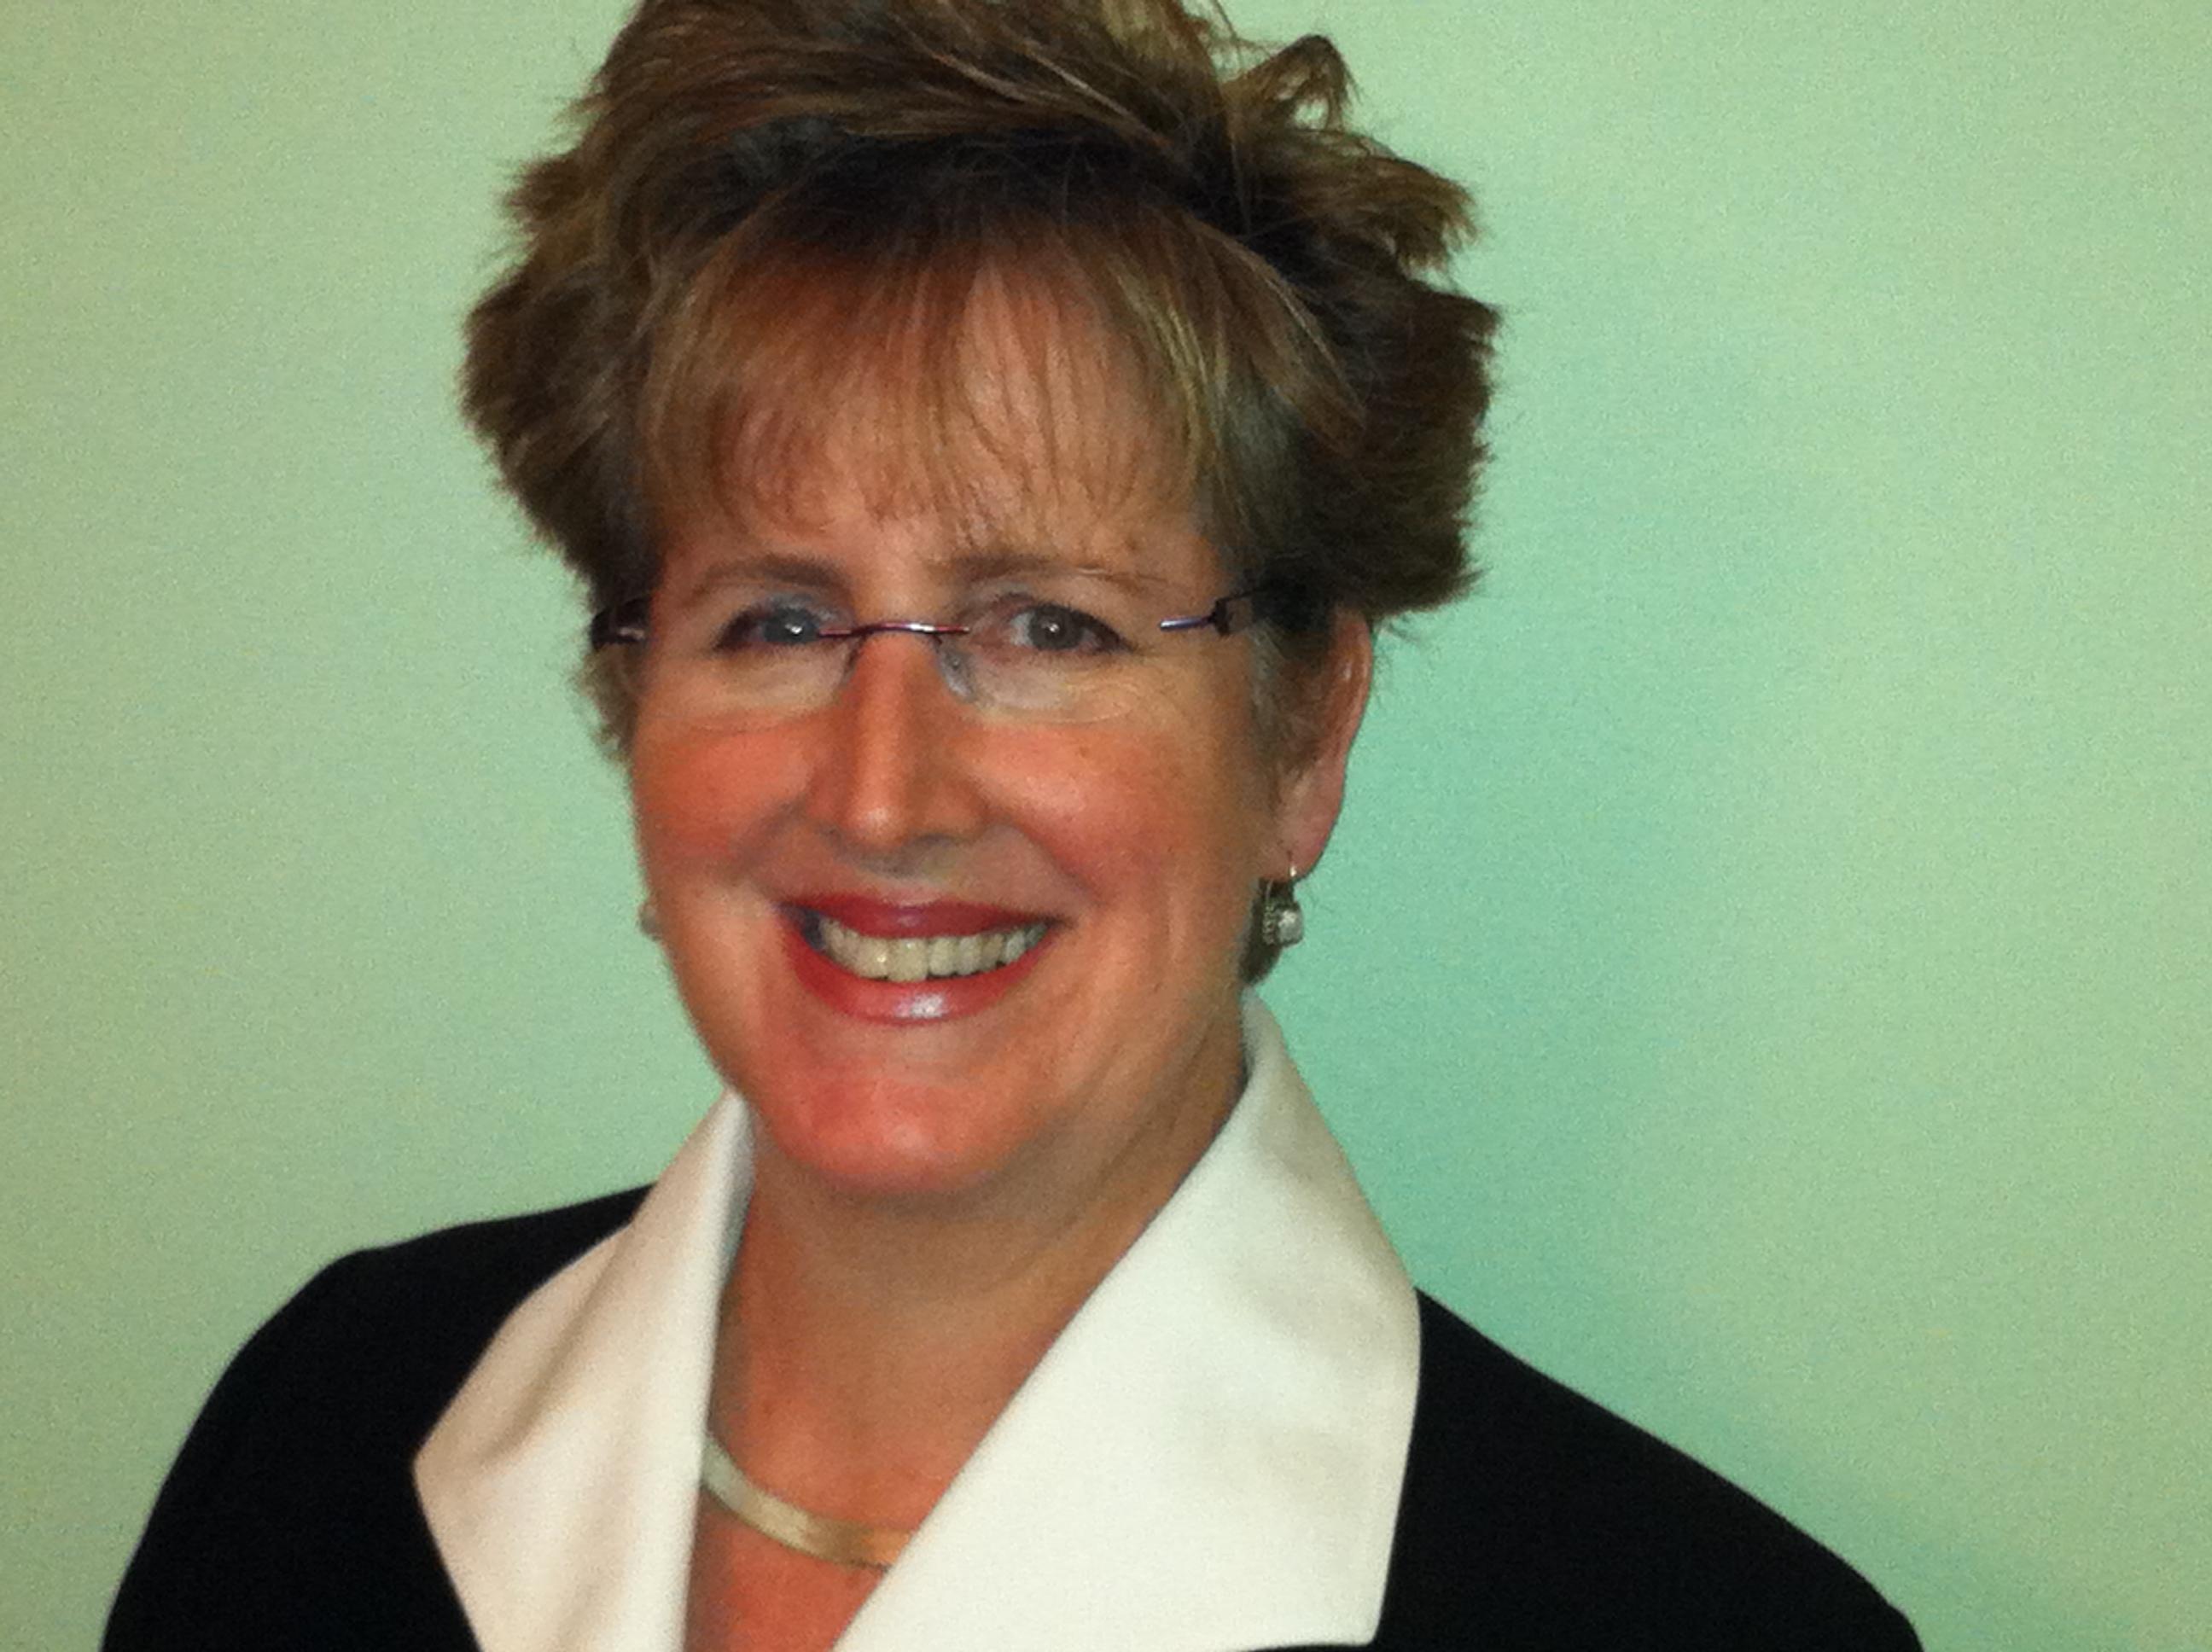 Intercessory Prayer Leader Betsy Hundley bhundley@triad.rr.com